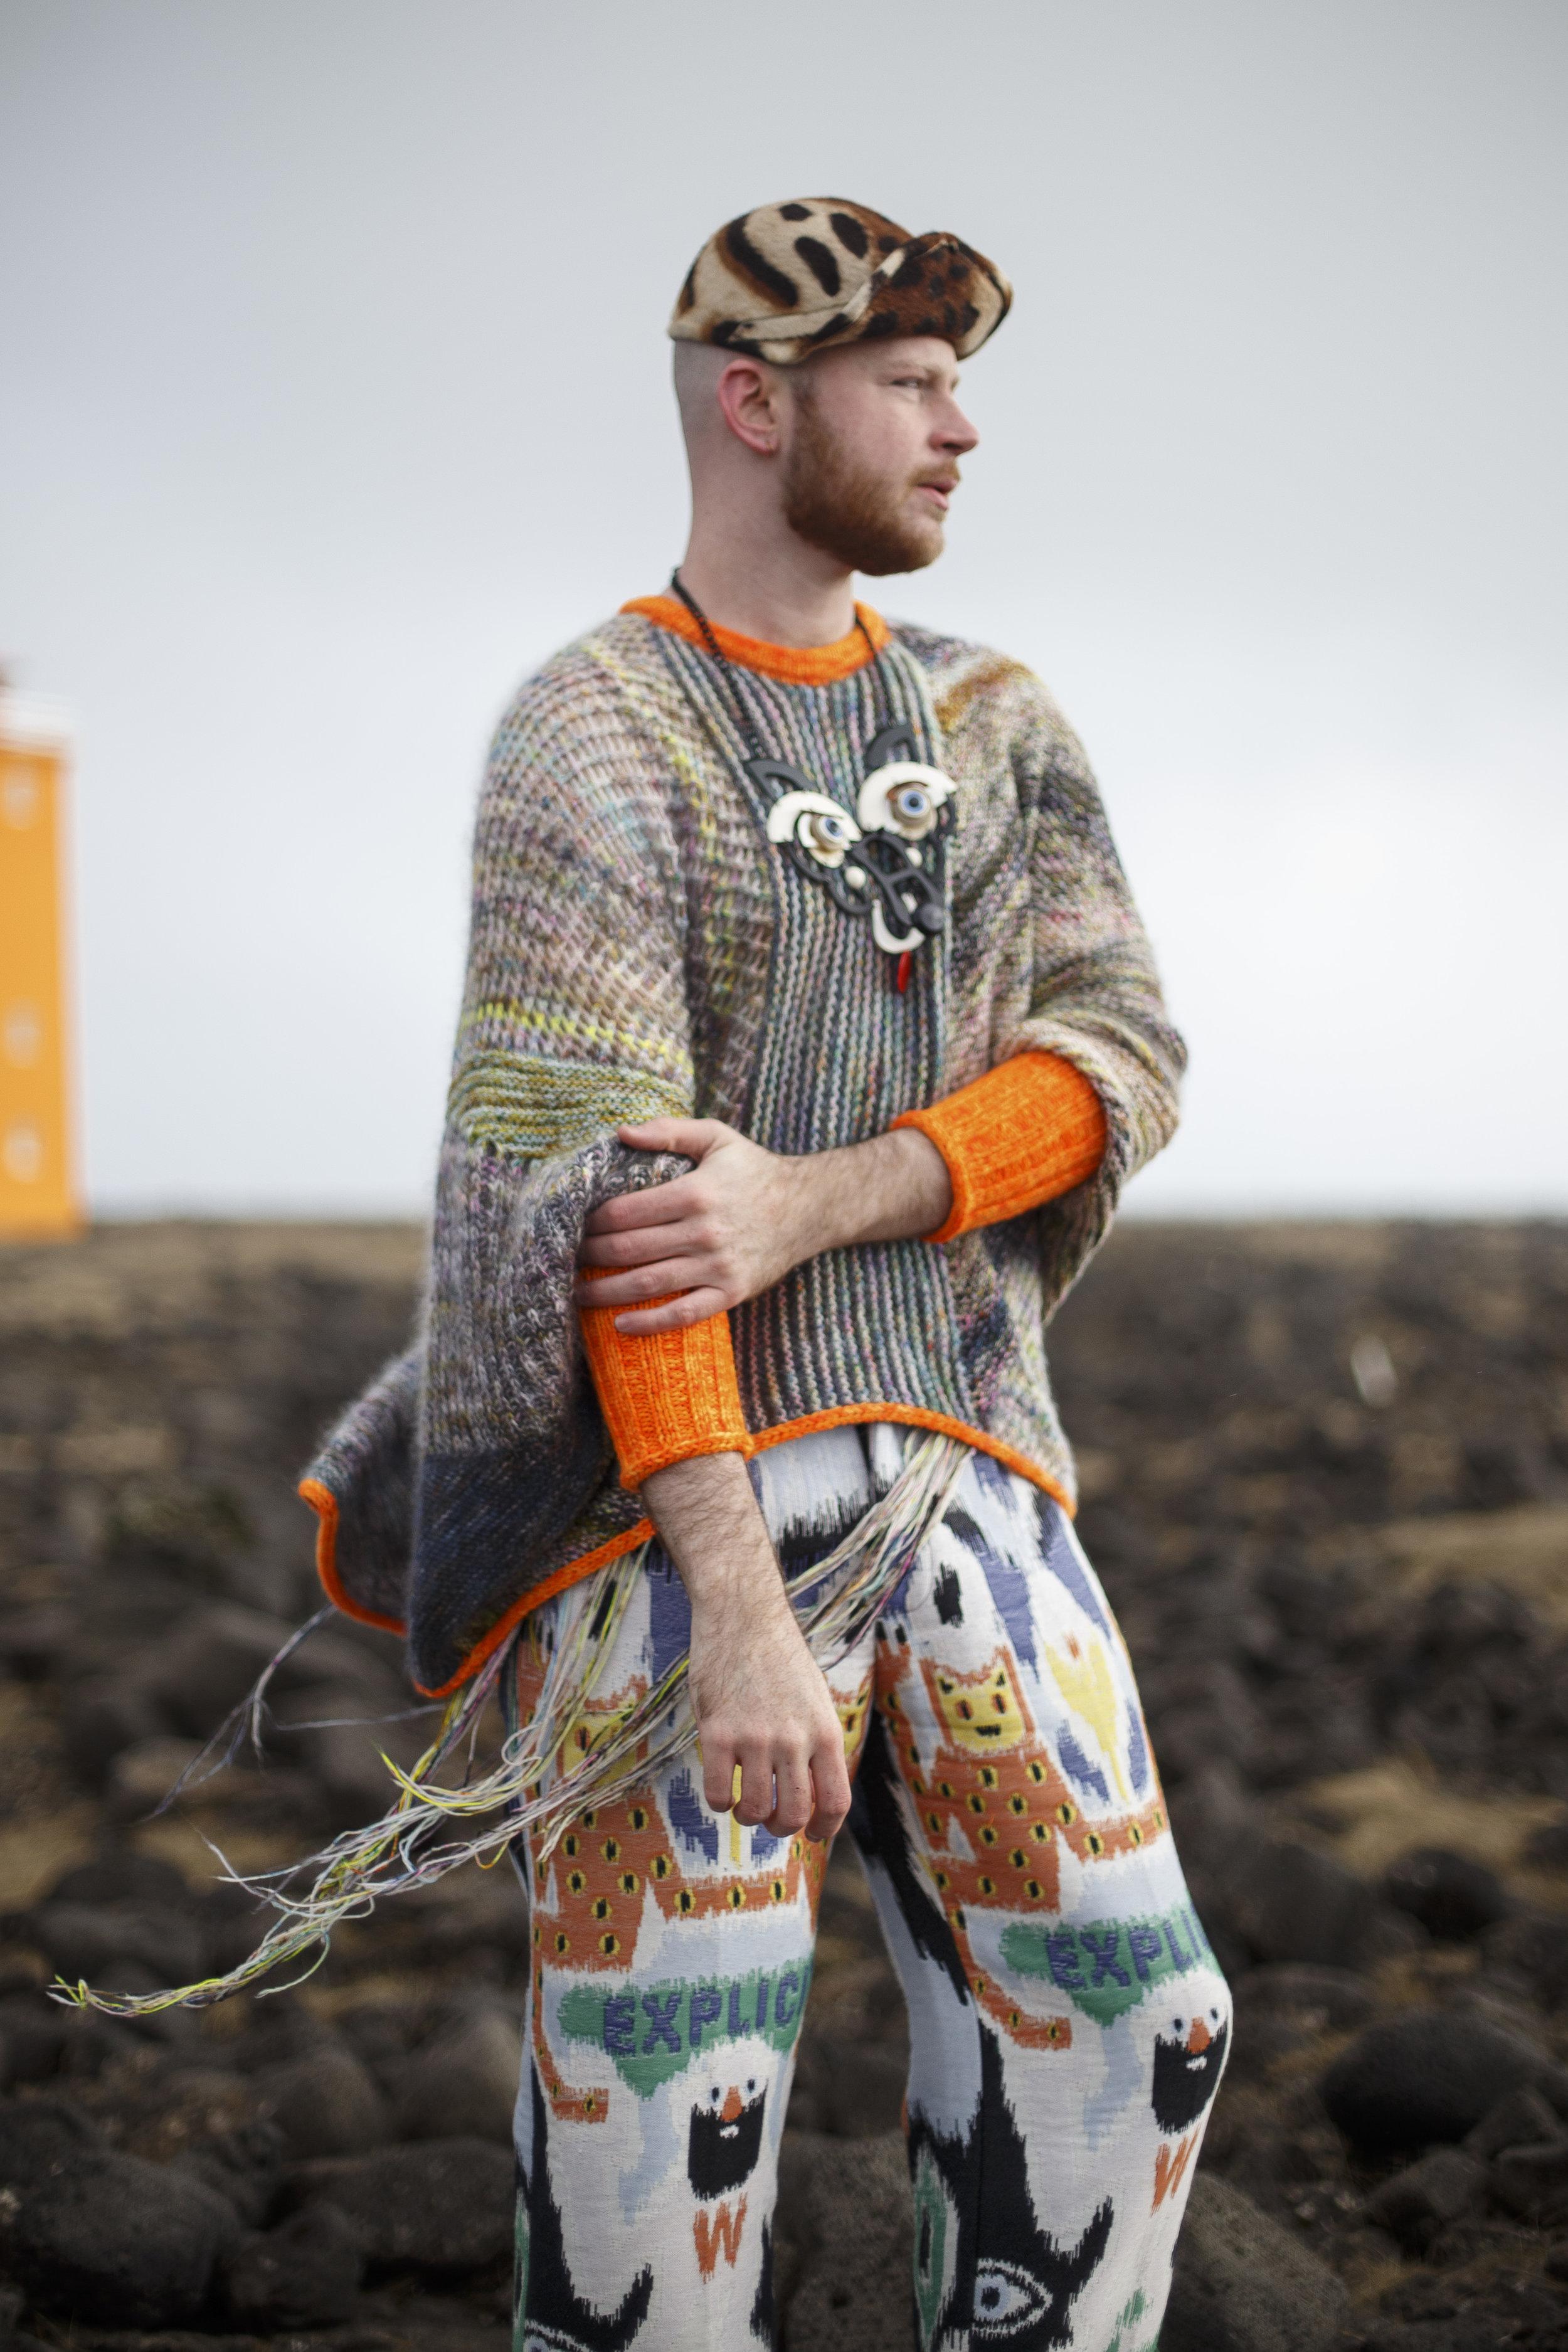 Stephen West Iceland Day 1 (Marled Magic Sweater)